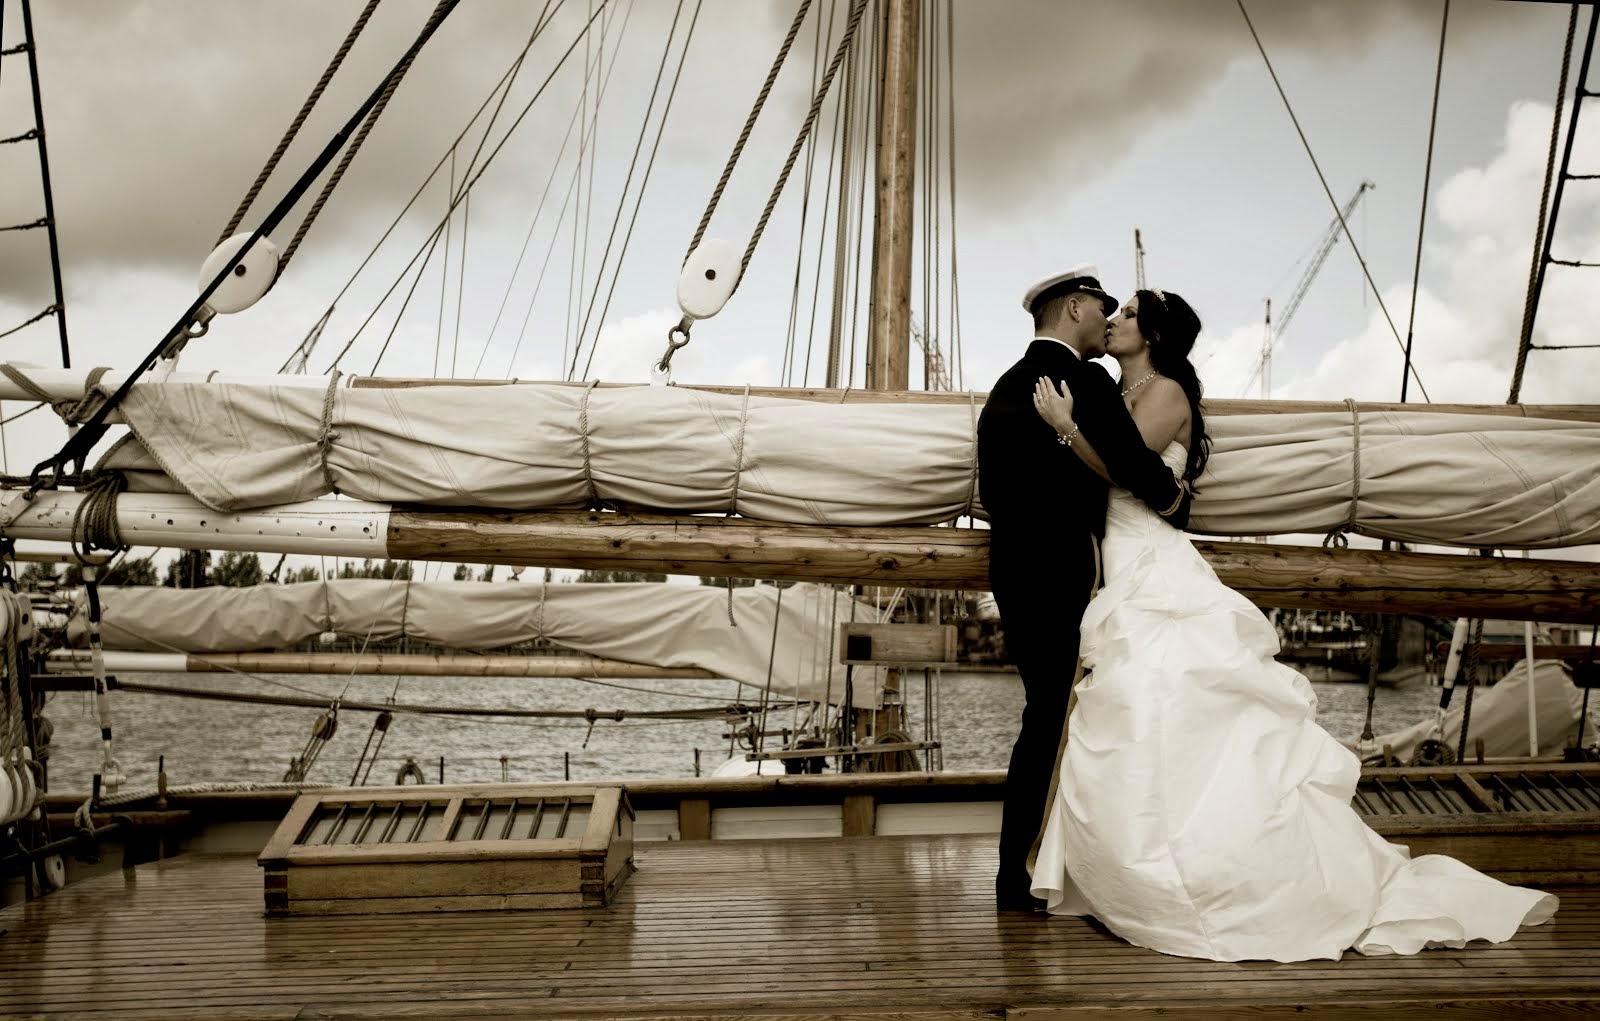 Vår bröllopsbild av BAZIQ.com   copyright Bruno Baziq